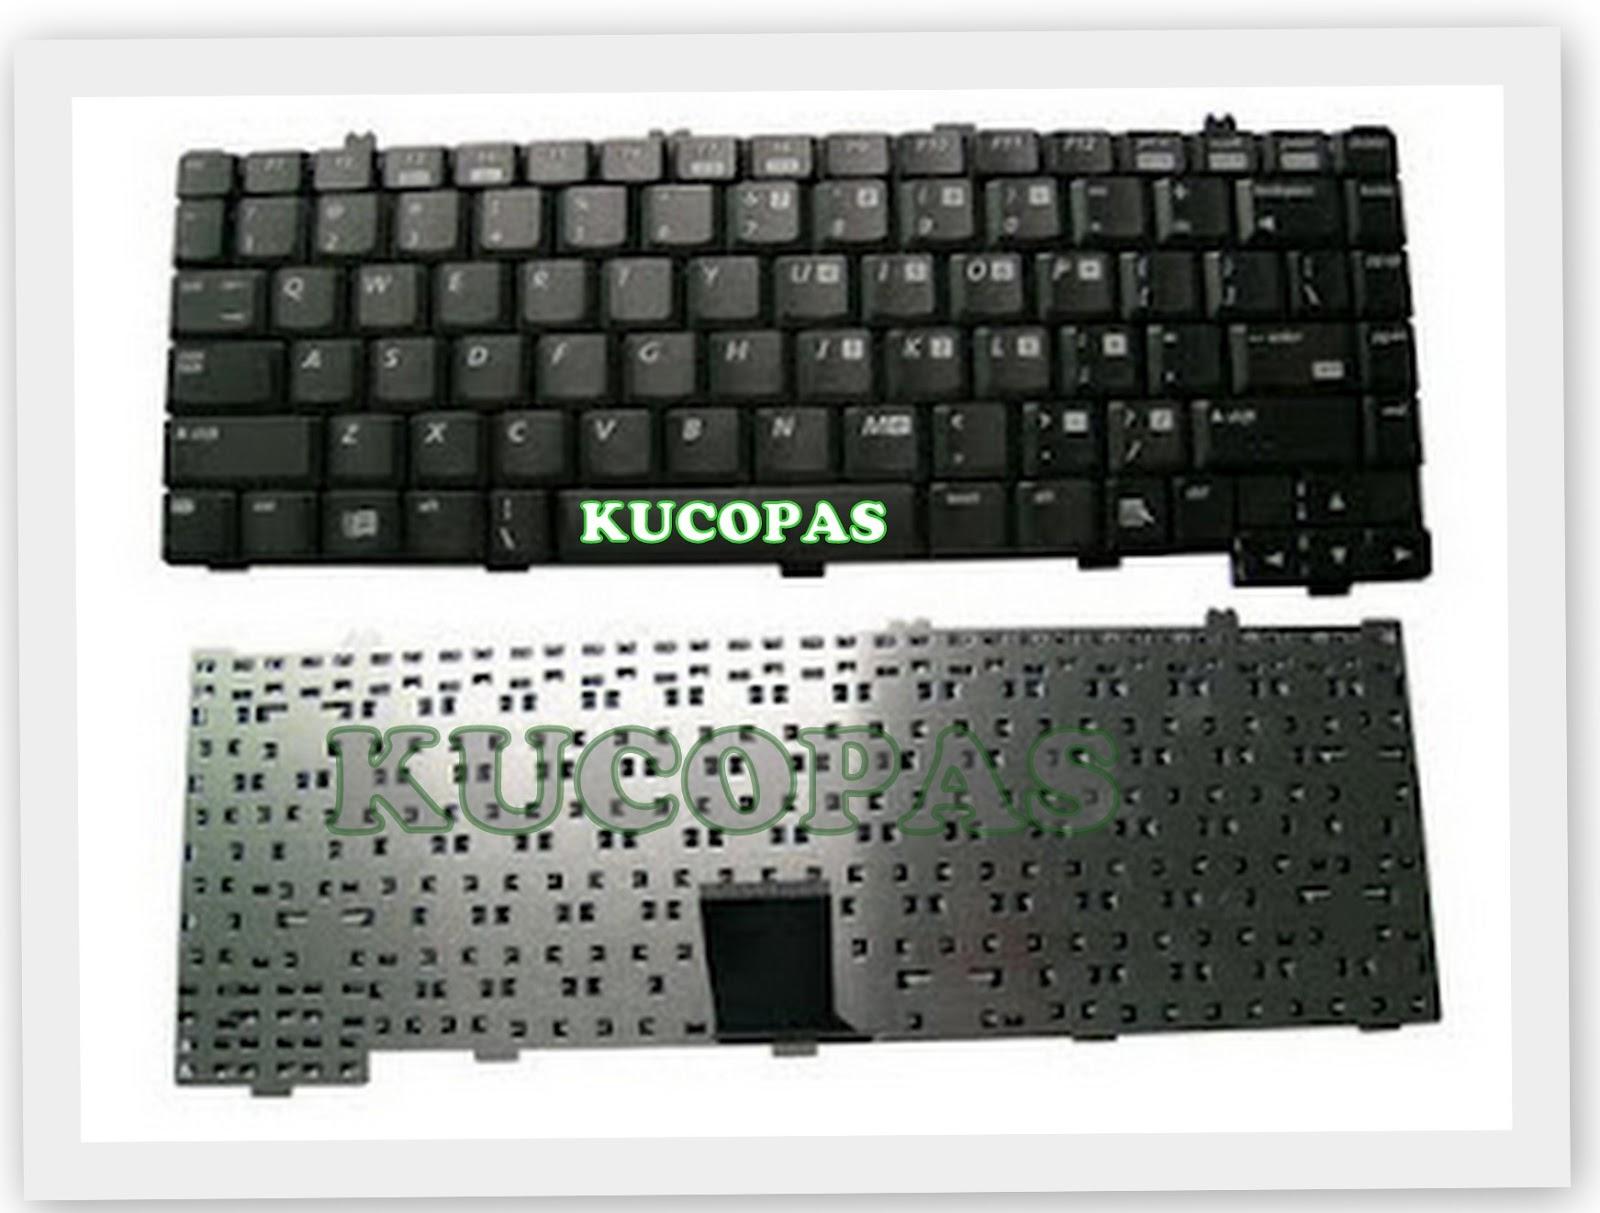 Cara Memperbaiki Keyboard Notebook Atau Laptop Yang Error